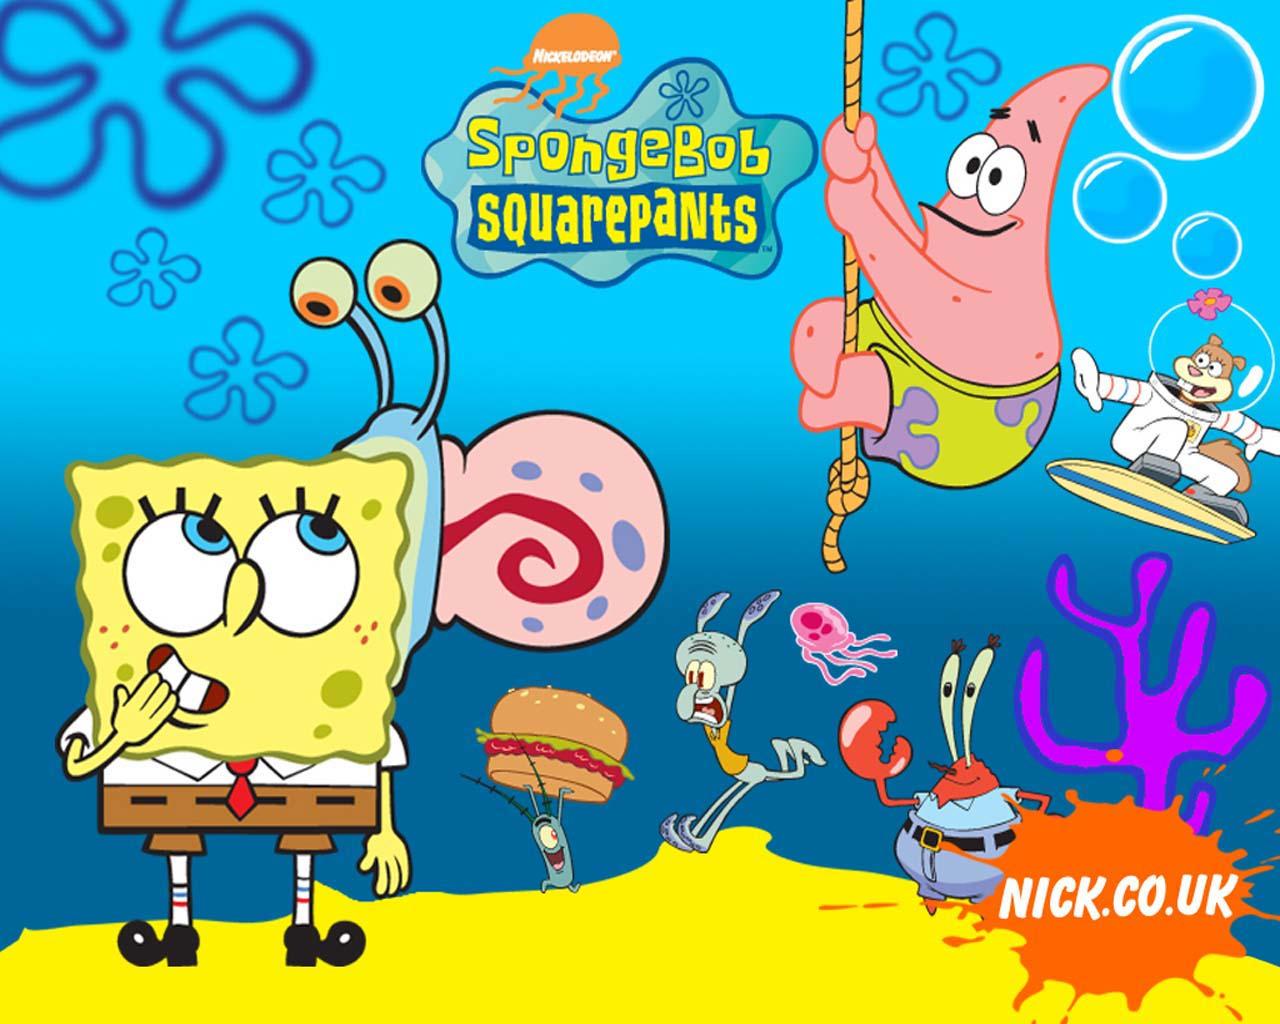 Spongebob Squarepants images Rainbow HD wallpaper and